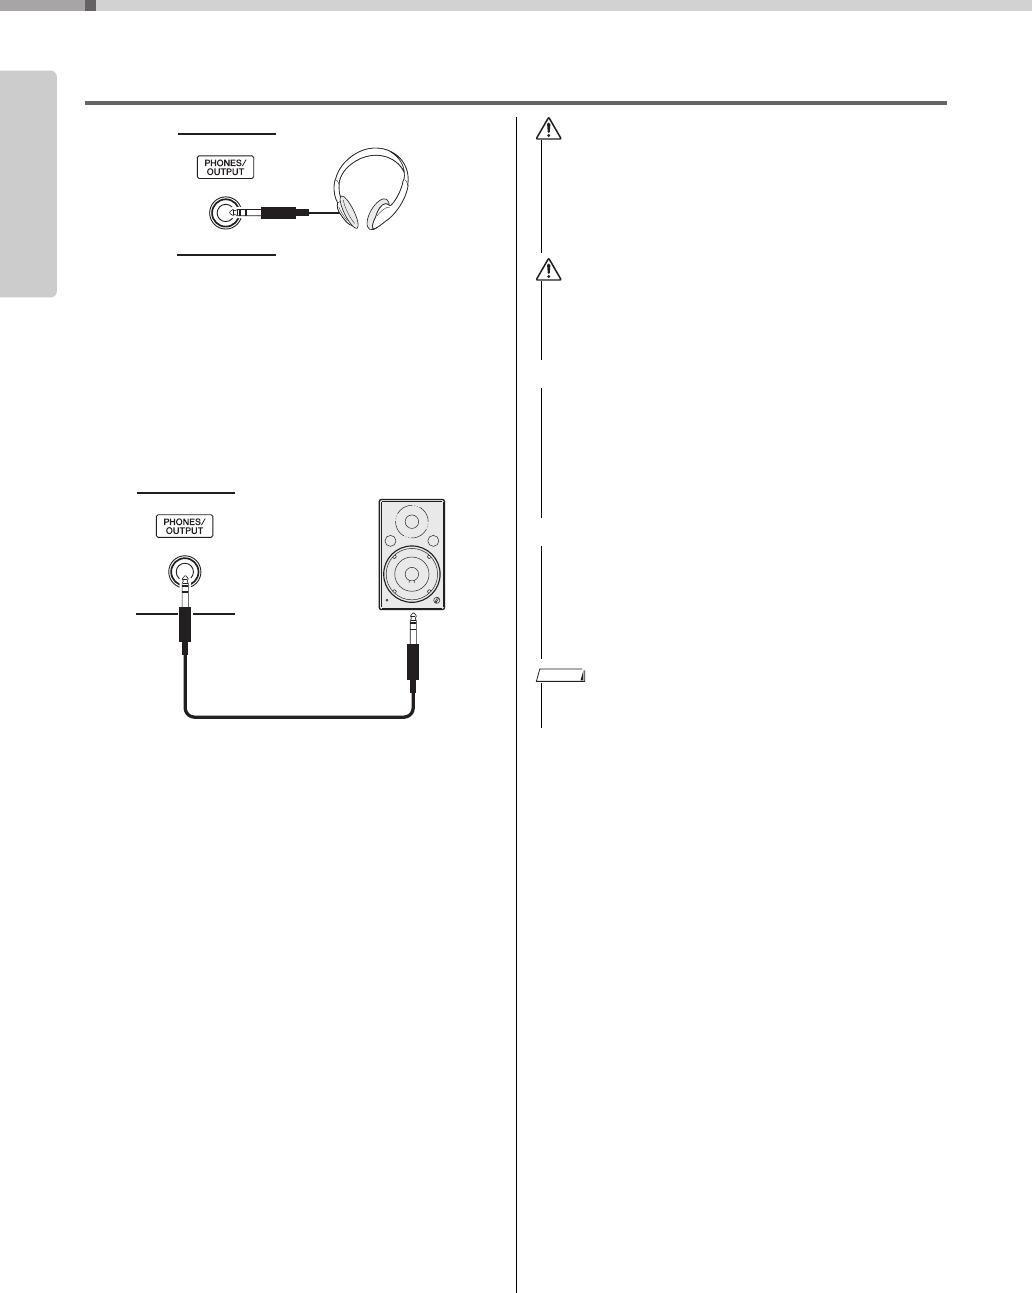 dxg technology dgx 660 owners manual download page 20 rh rsmanuals com DXG Model 305V DXG Camcorder Manual